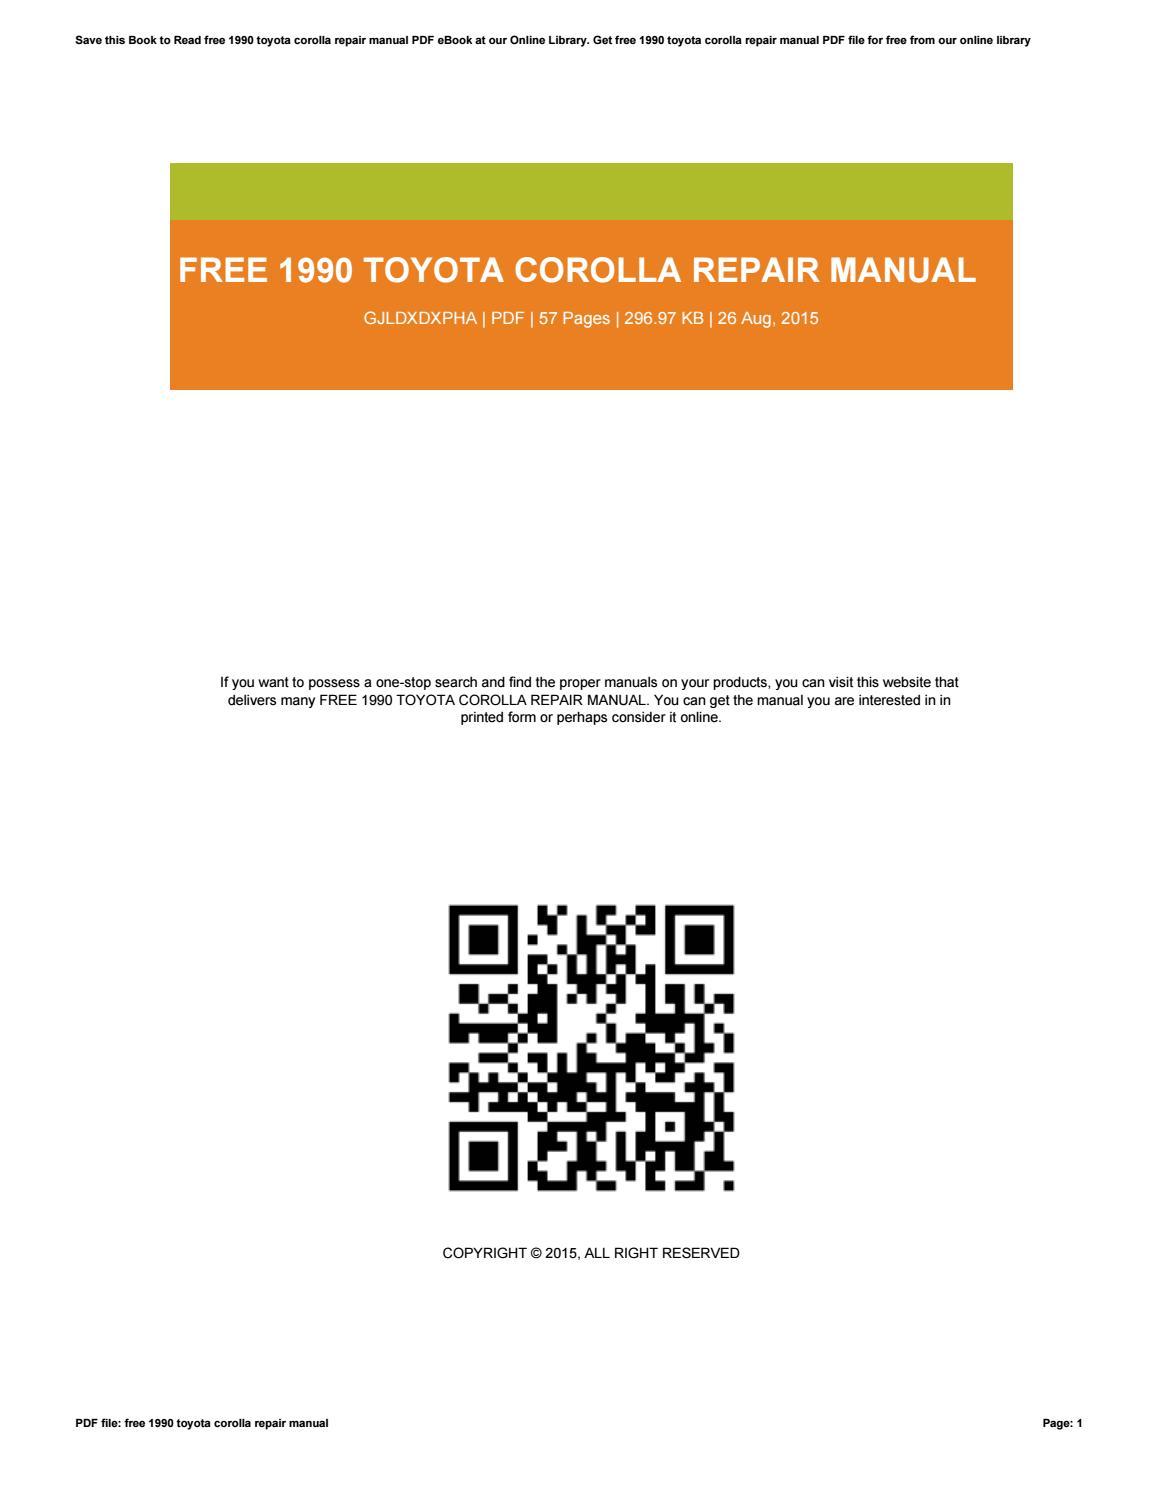 free 1990 toyota corolla repair manual by terry leach issuu rh issuu com 1995 Corolla 1995 Corolla